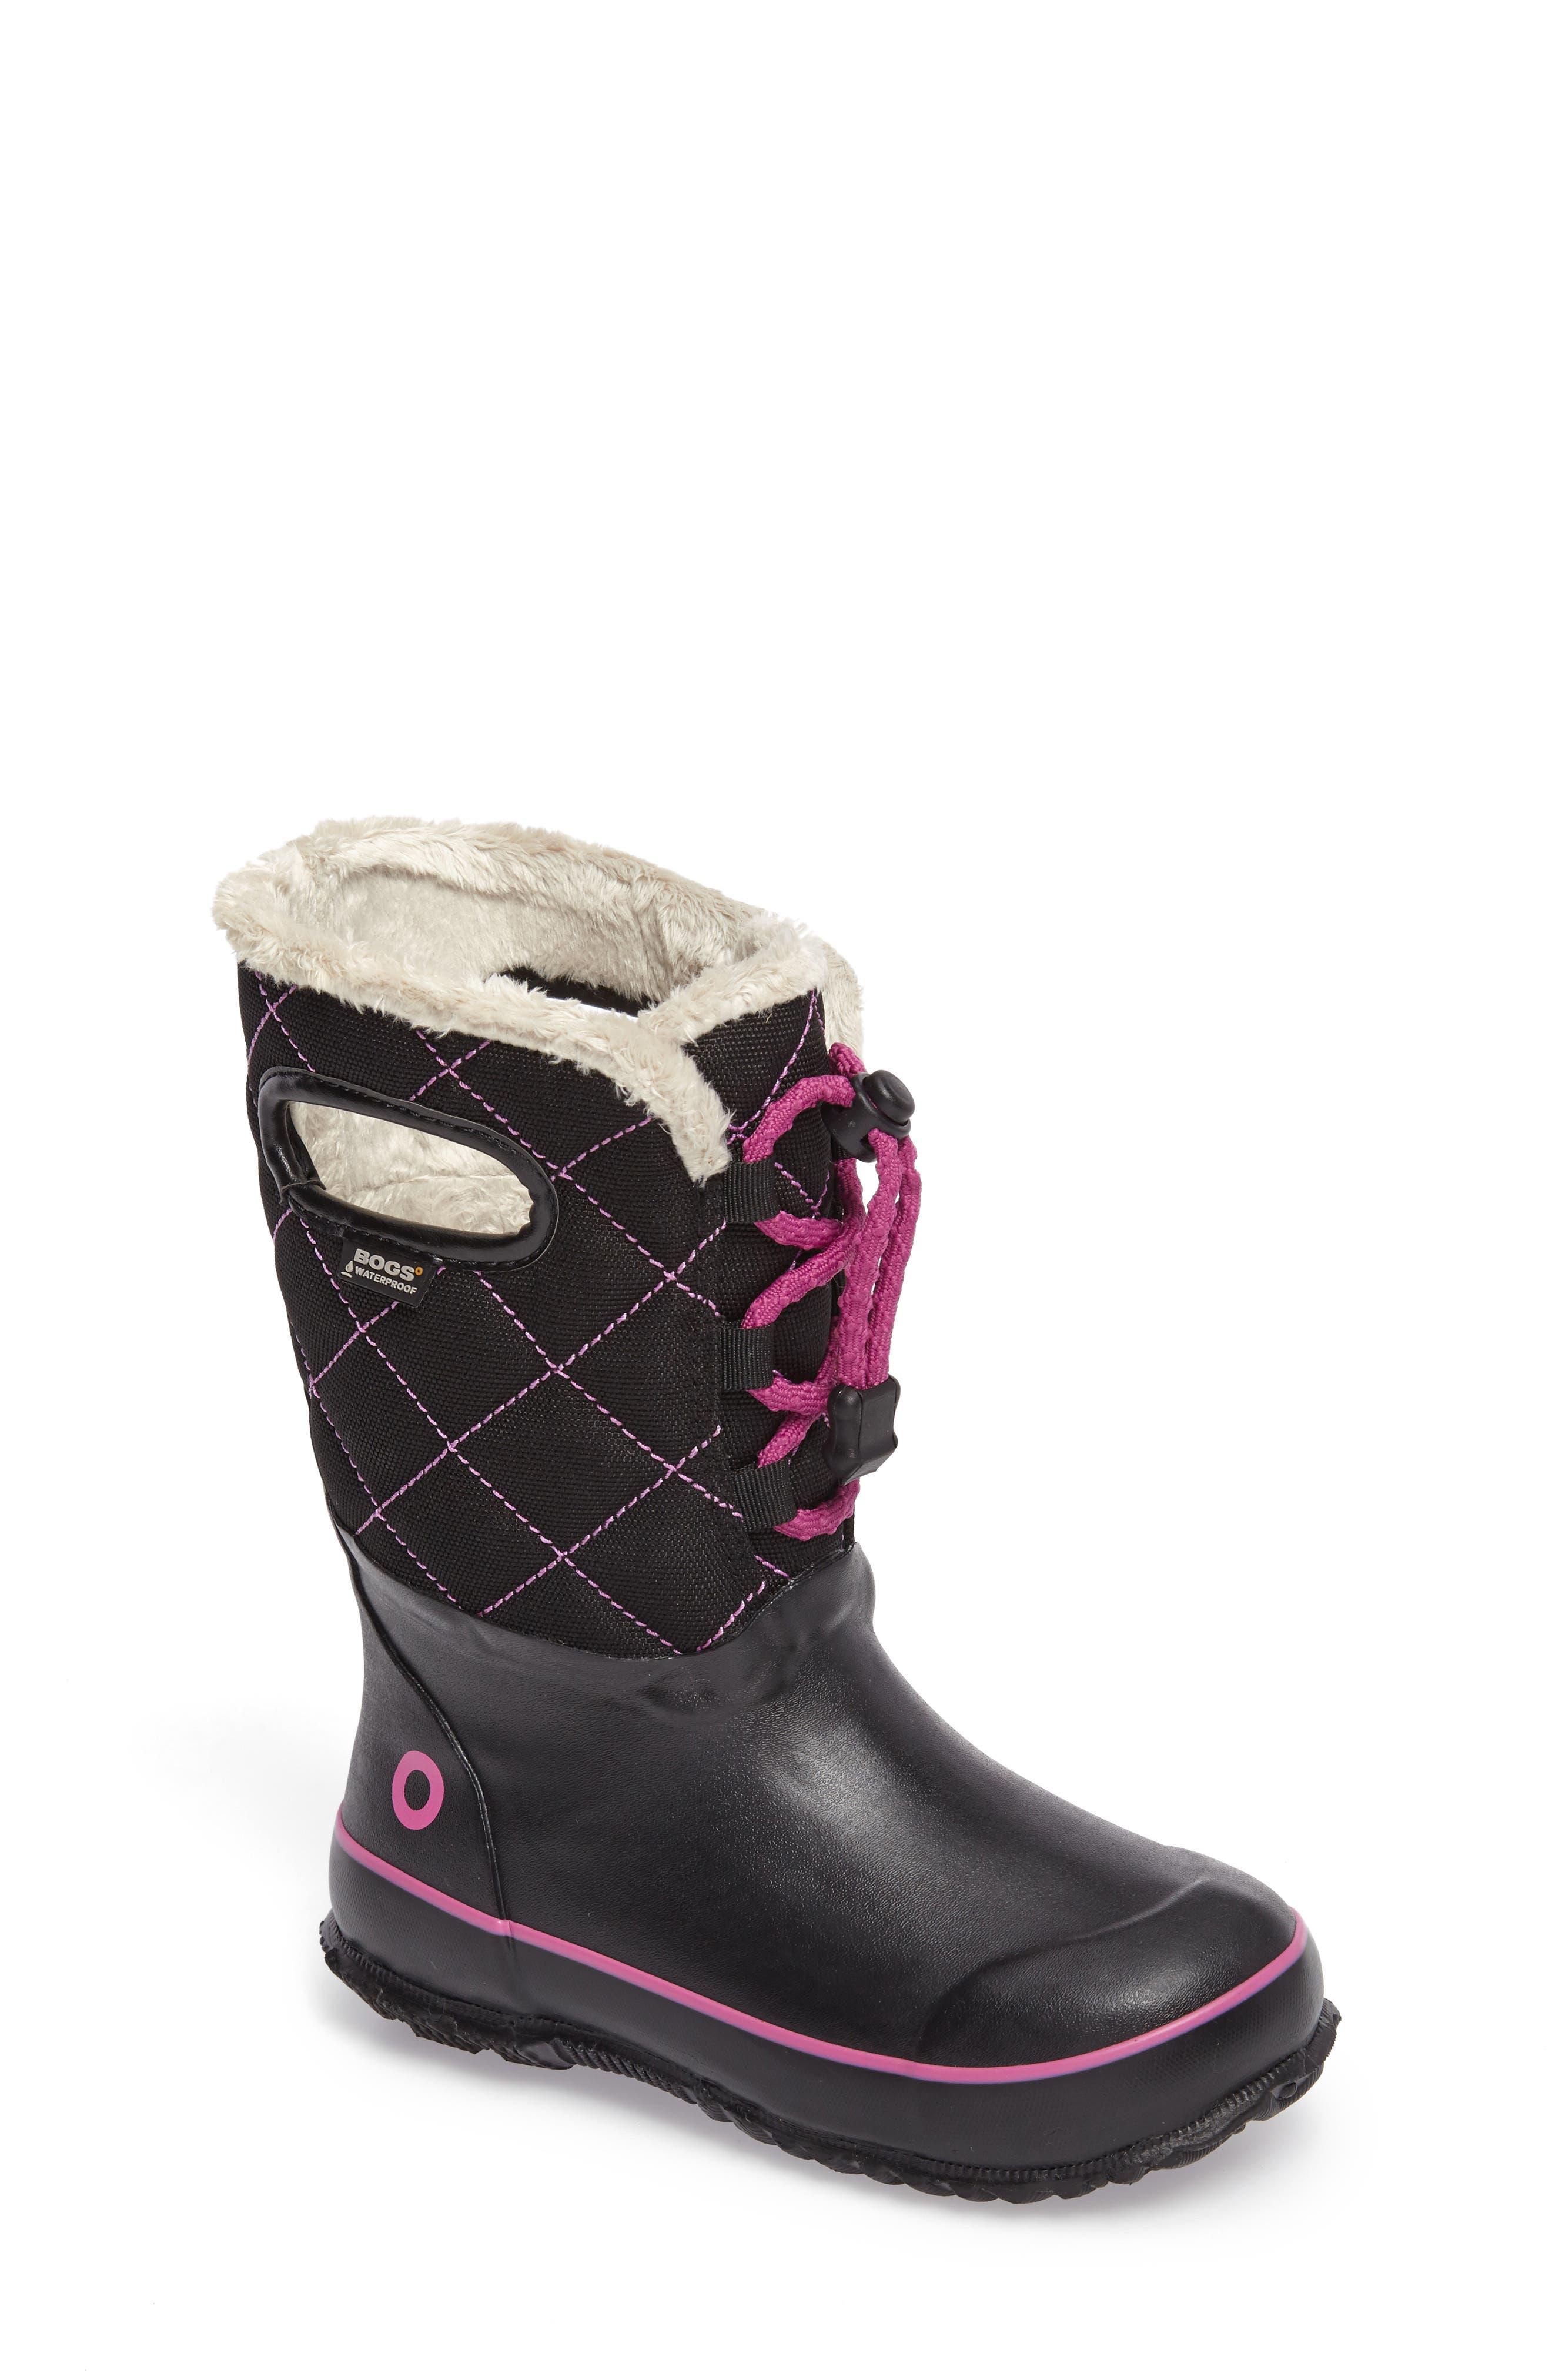 Bogs Juno Faux Fur Insulated Waterproof Boot (Toddler, Little Kid & Big Kid)